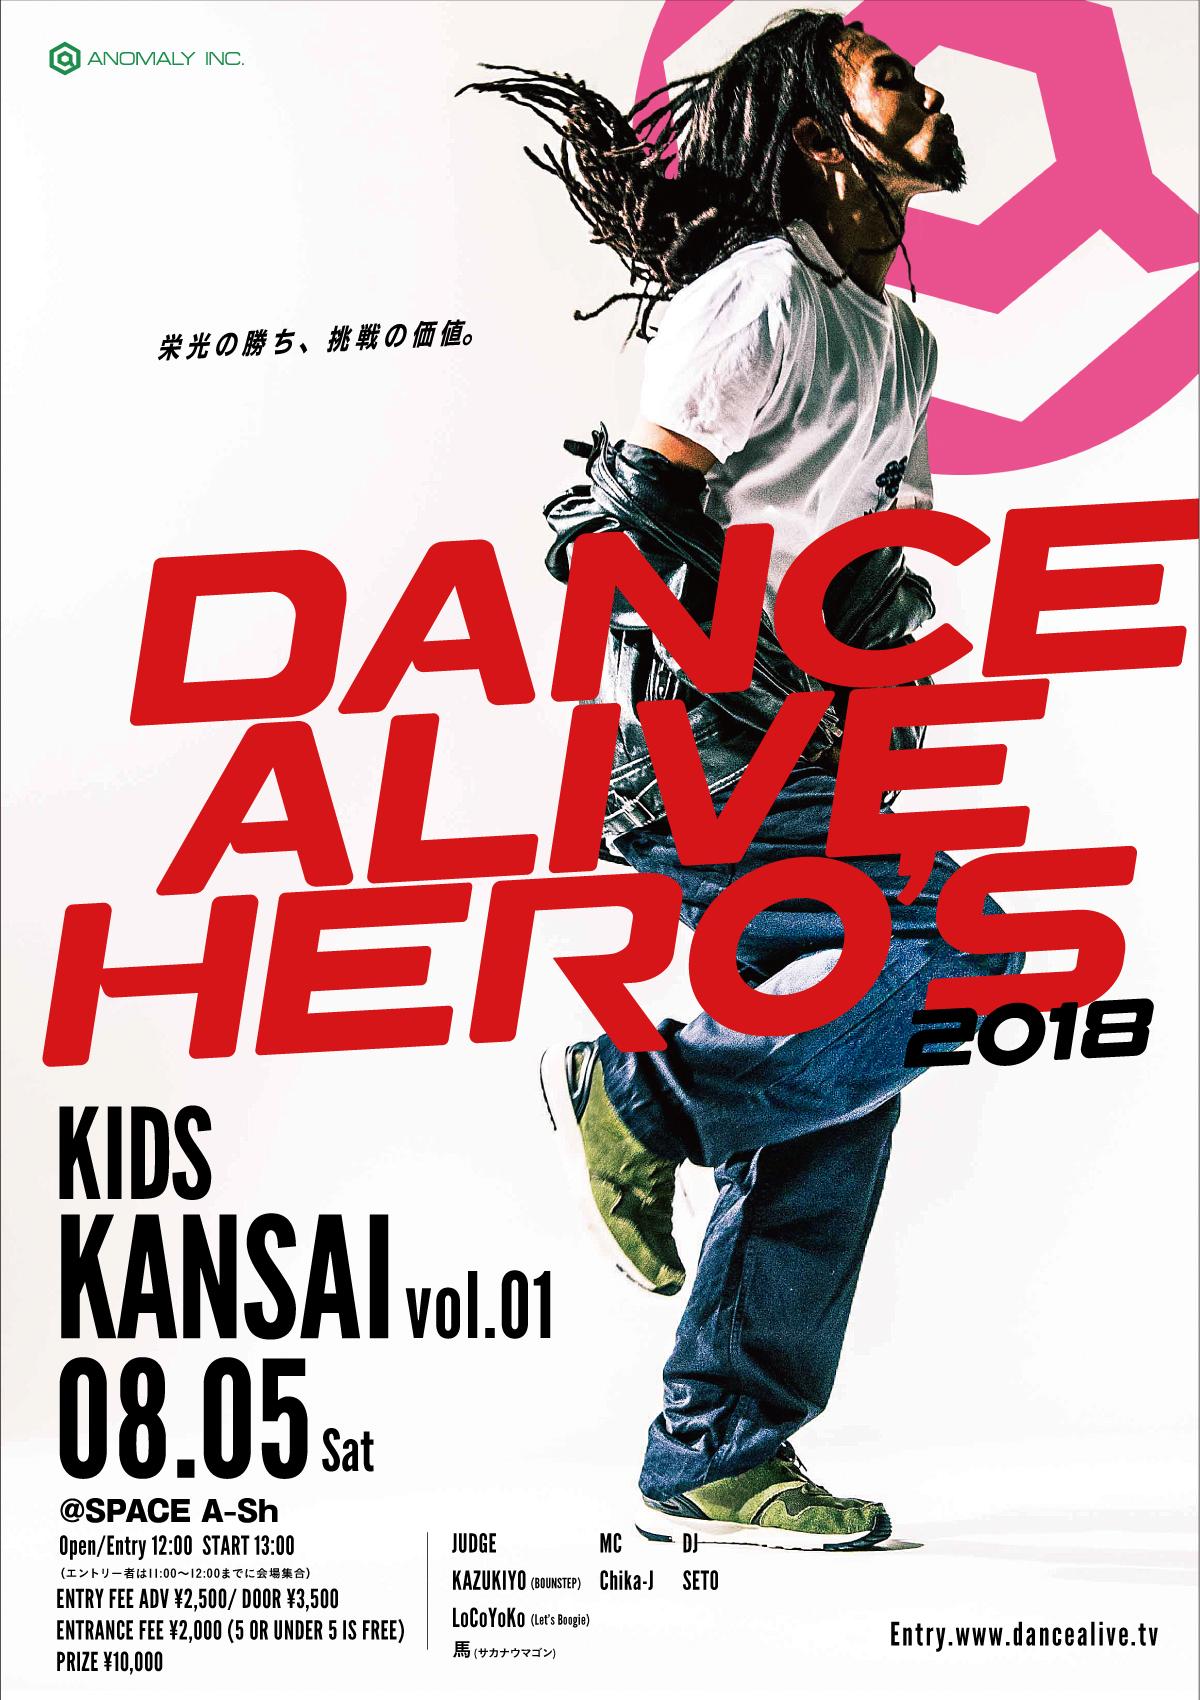 DANCE ALIVE 2018 KIDS KANSAI VOL.1